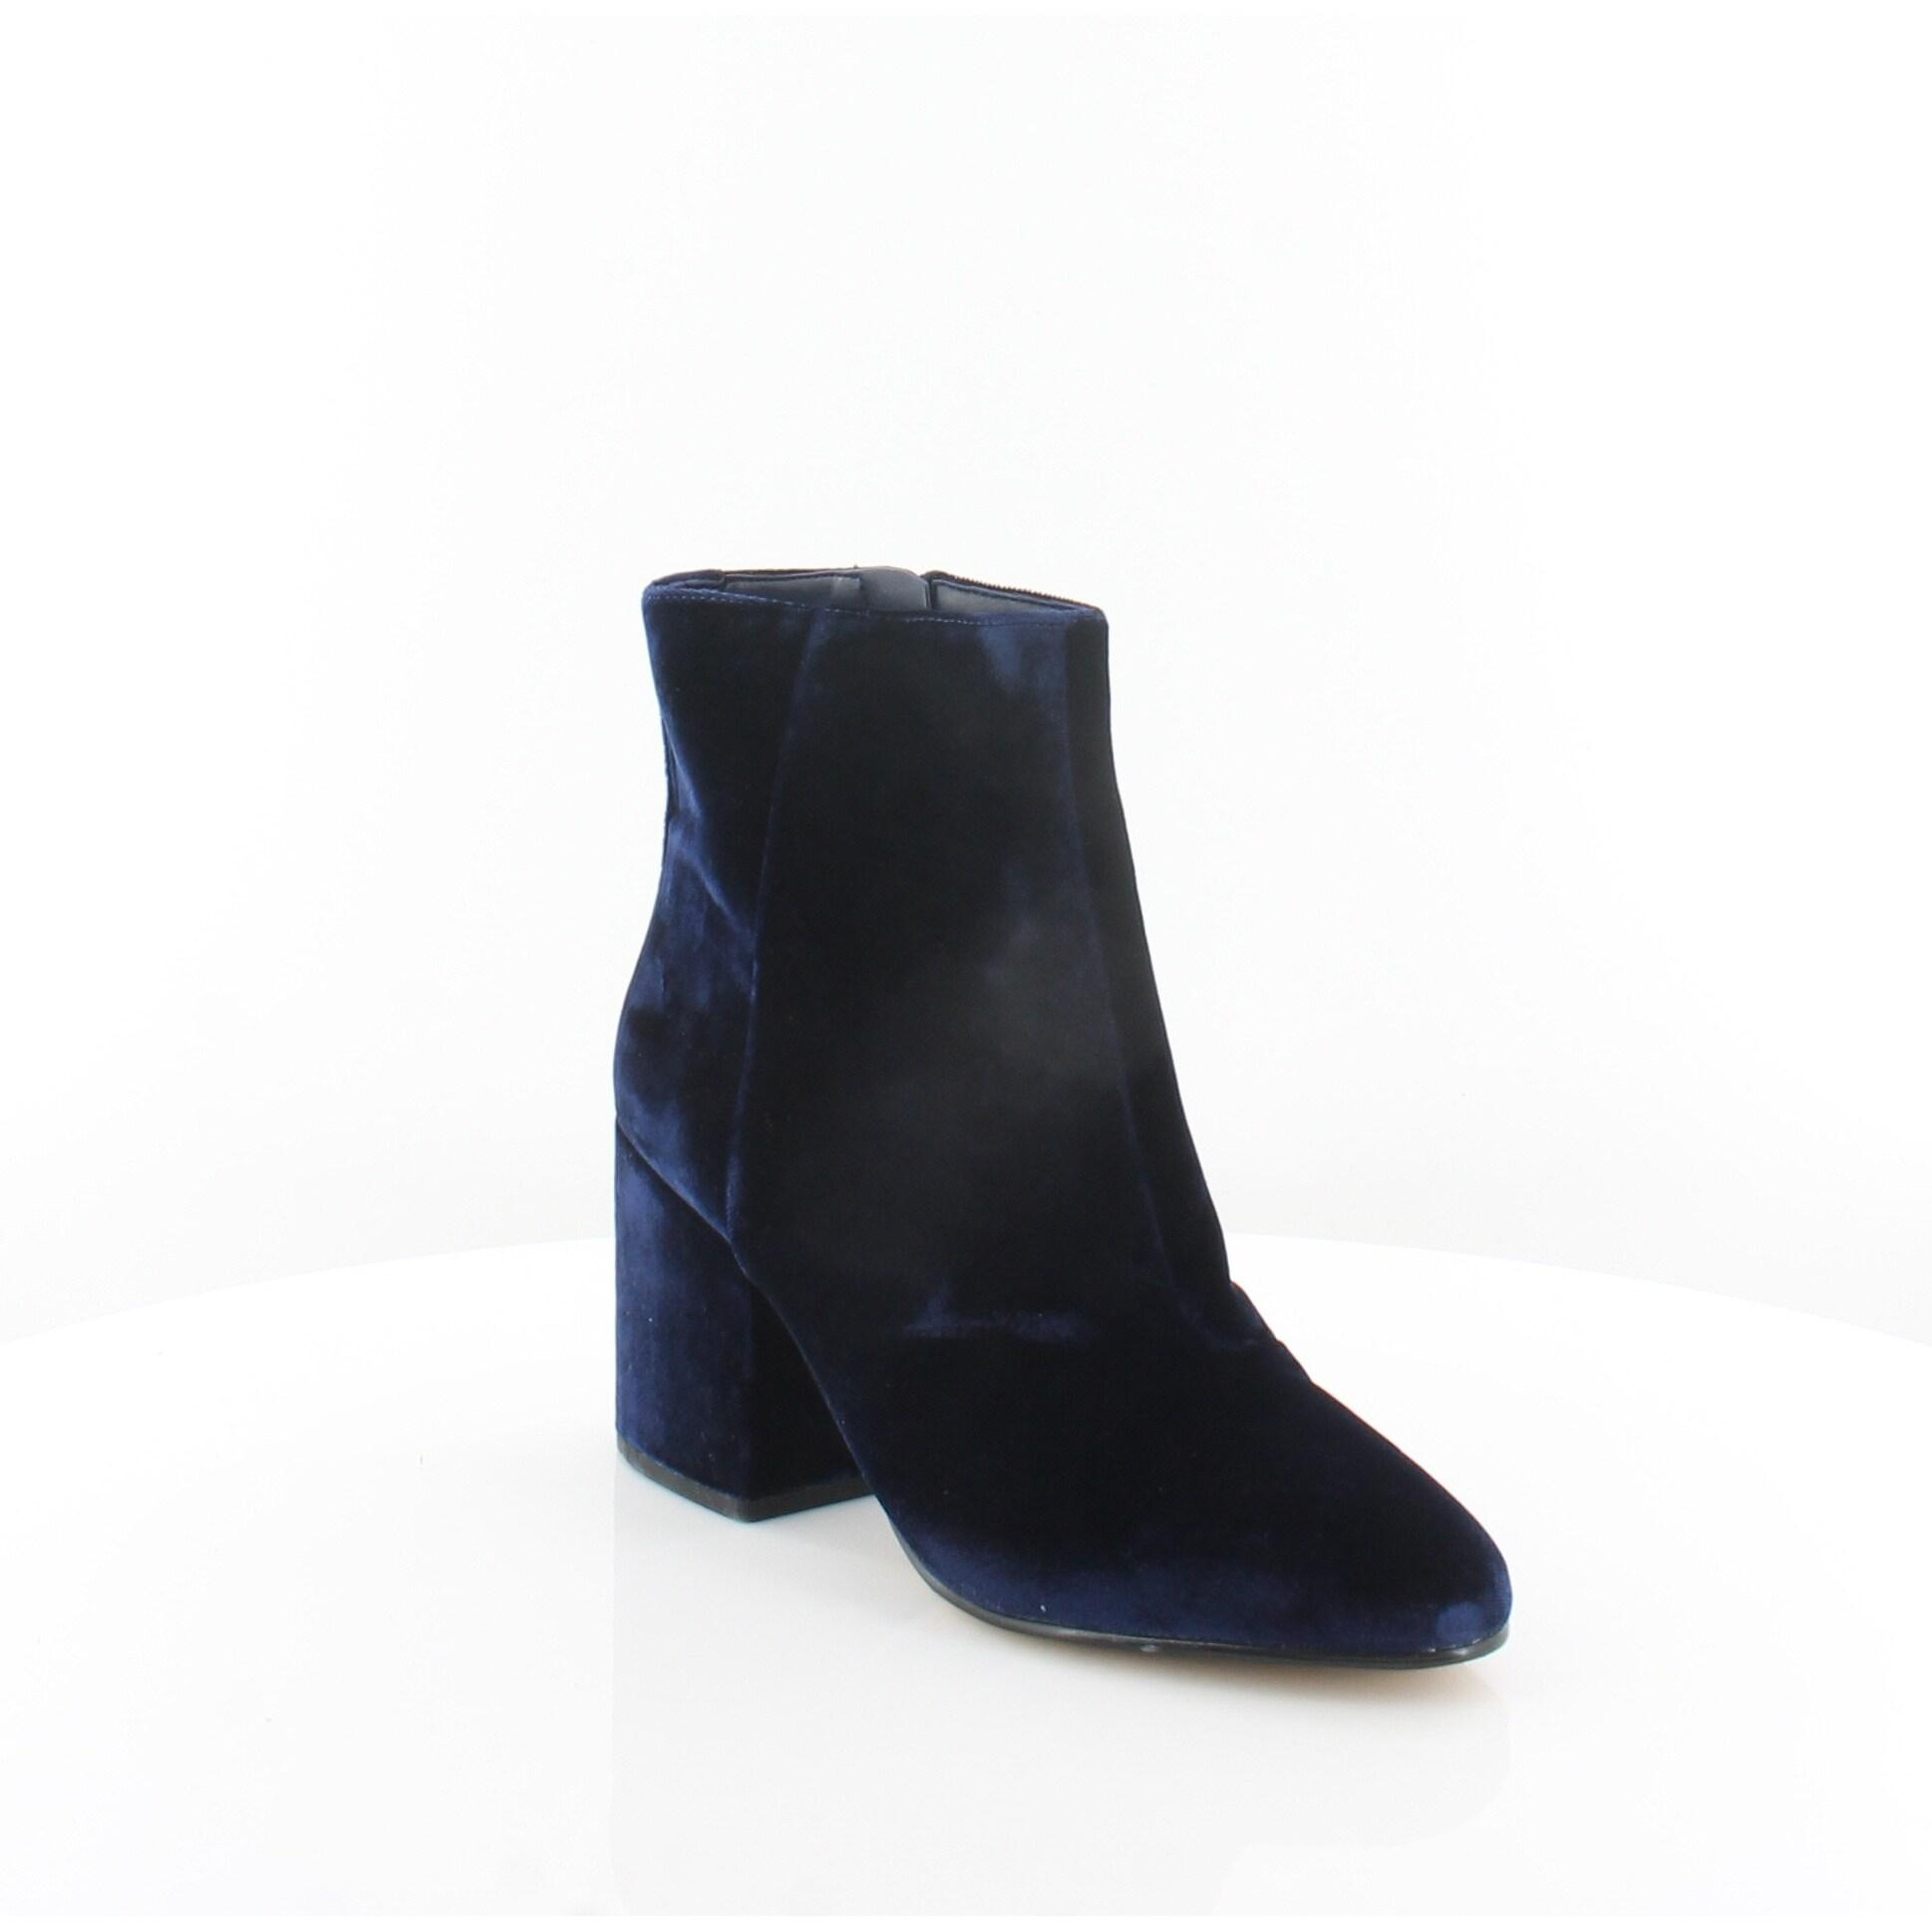 c72ddb718 Shop Sam Edelman Taye Women s Boots Navy - Free Shipping Today ...